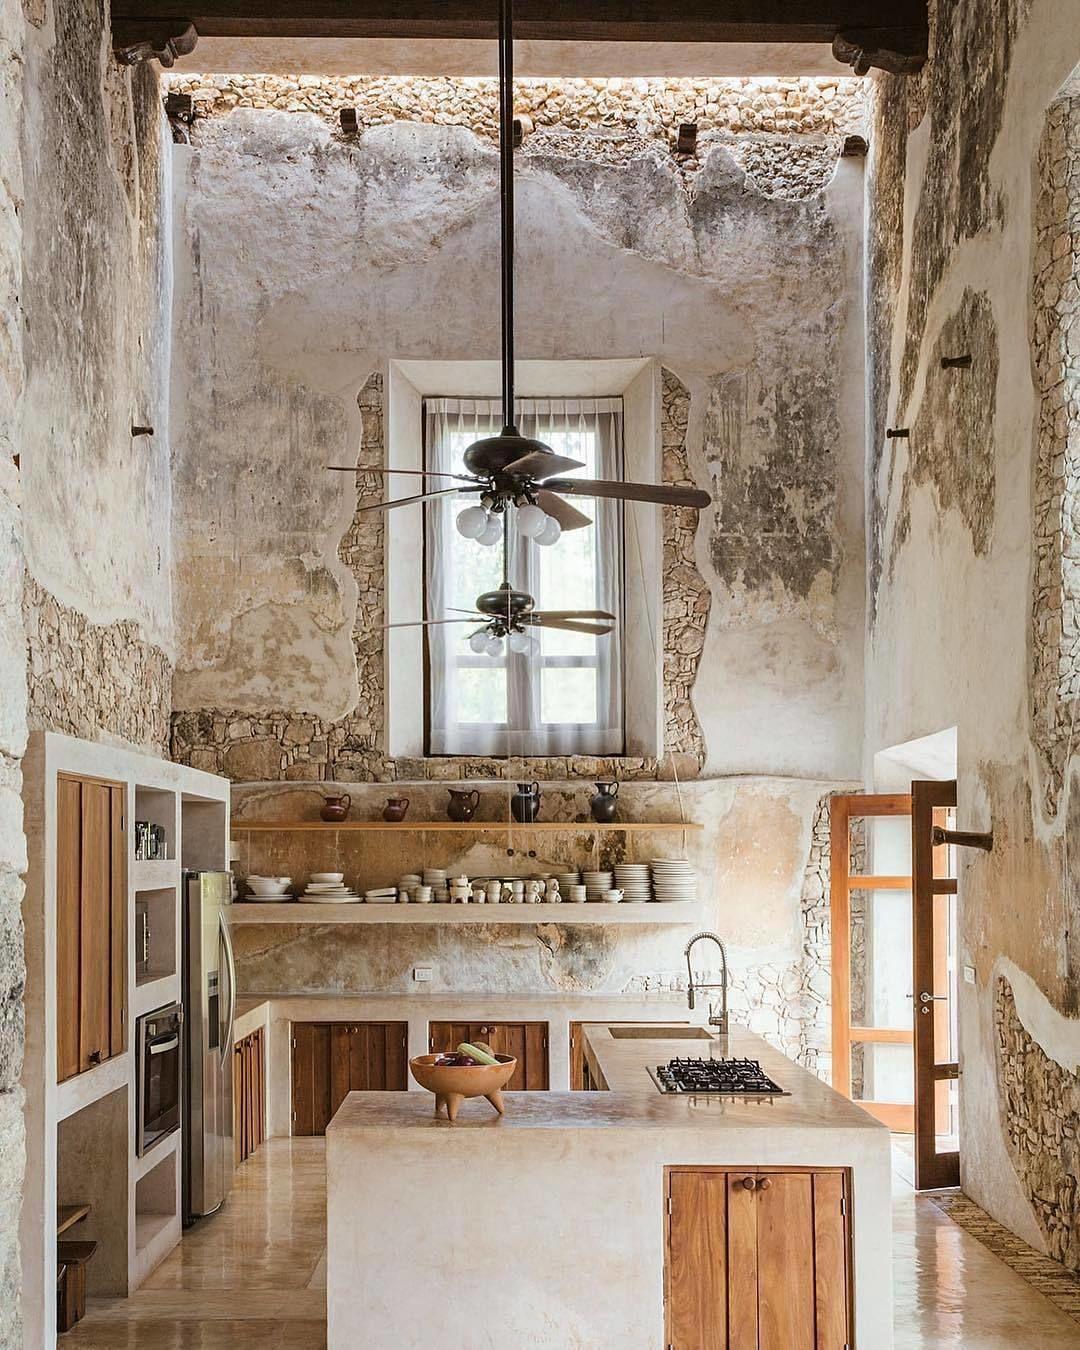 Futuristic Kitchen Stuff: Future Crete Kitchen. Interior Design & Decor On Instagram